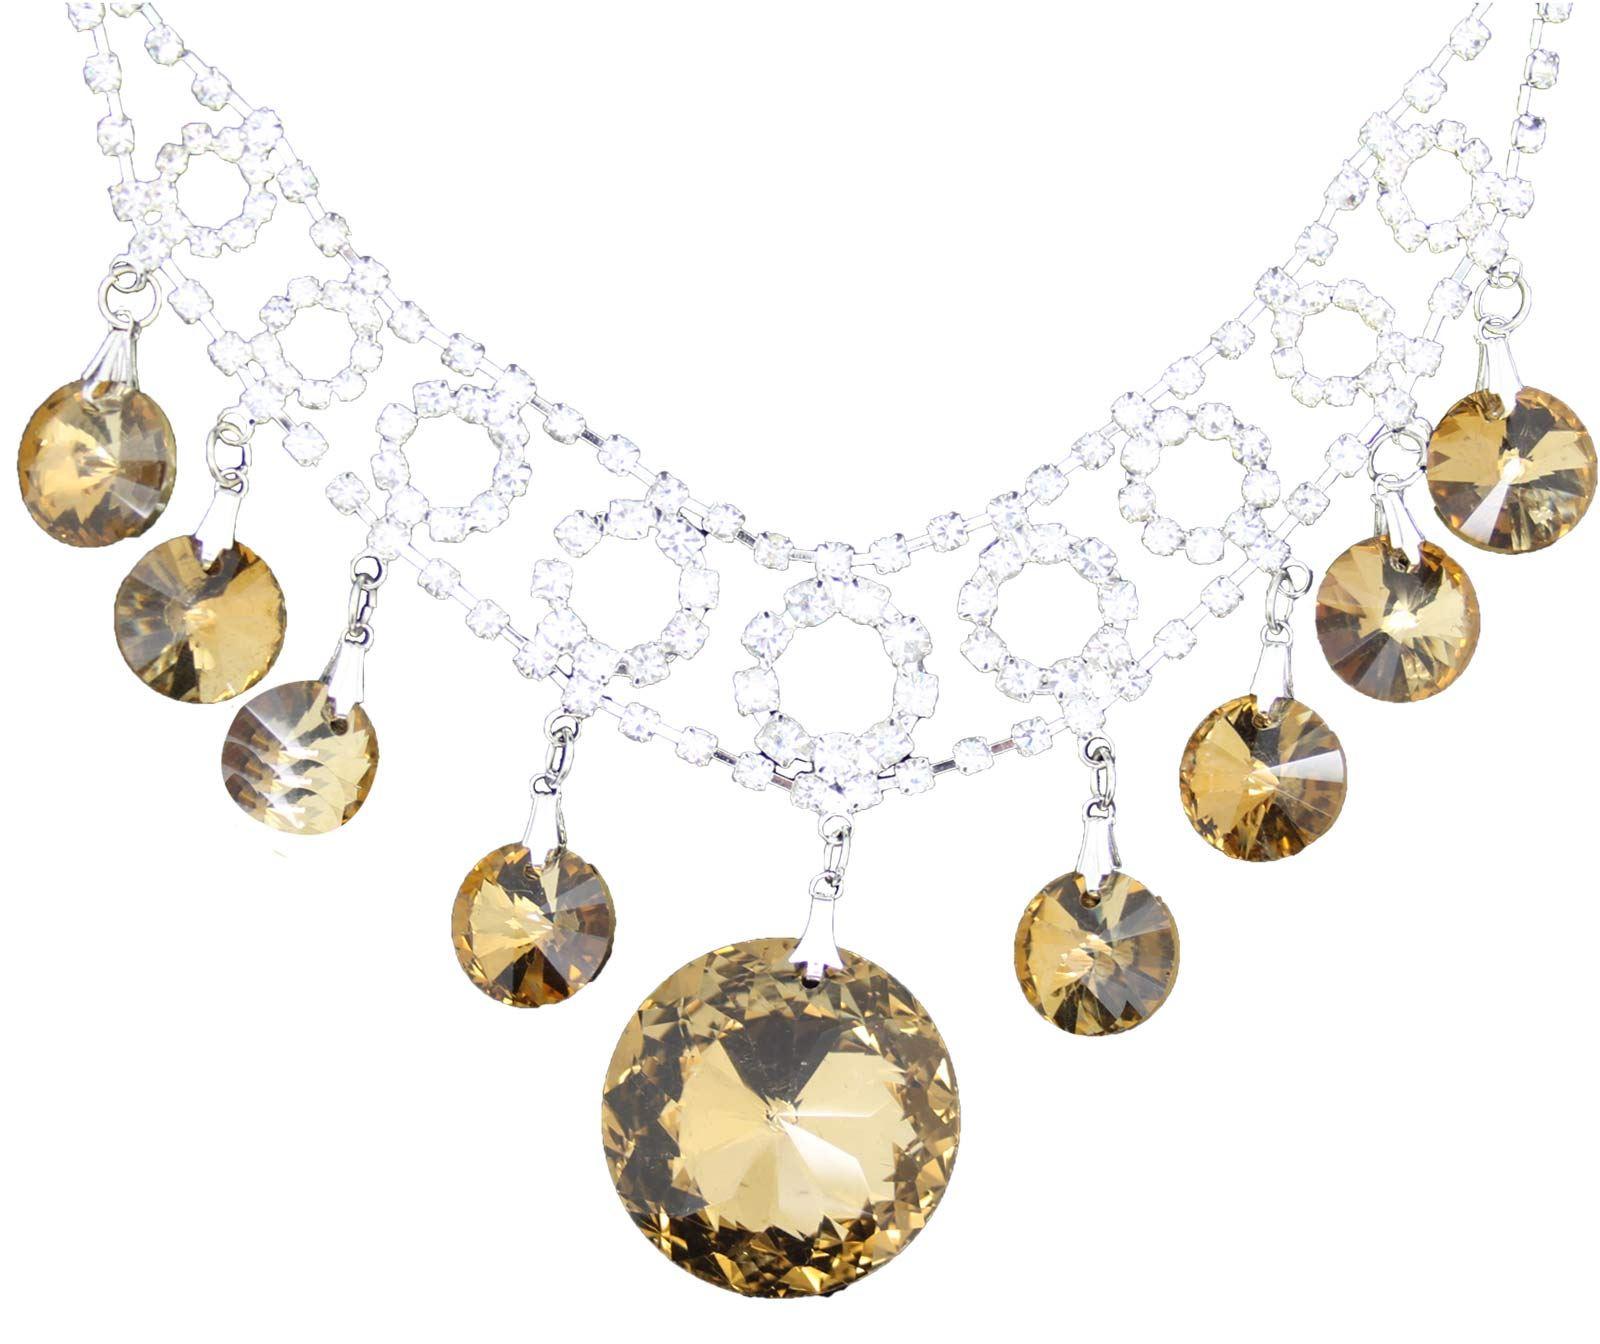 True-Face-Ladies-Women-039-s-Elegant-Earrings-Necklace-Set-Metal-Alloy-Jewellery thumbnail 10